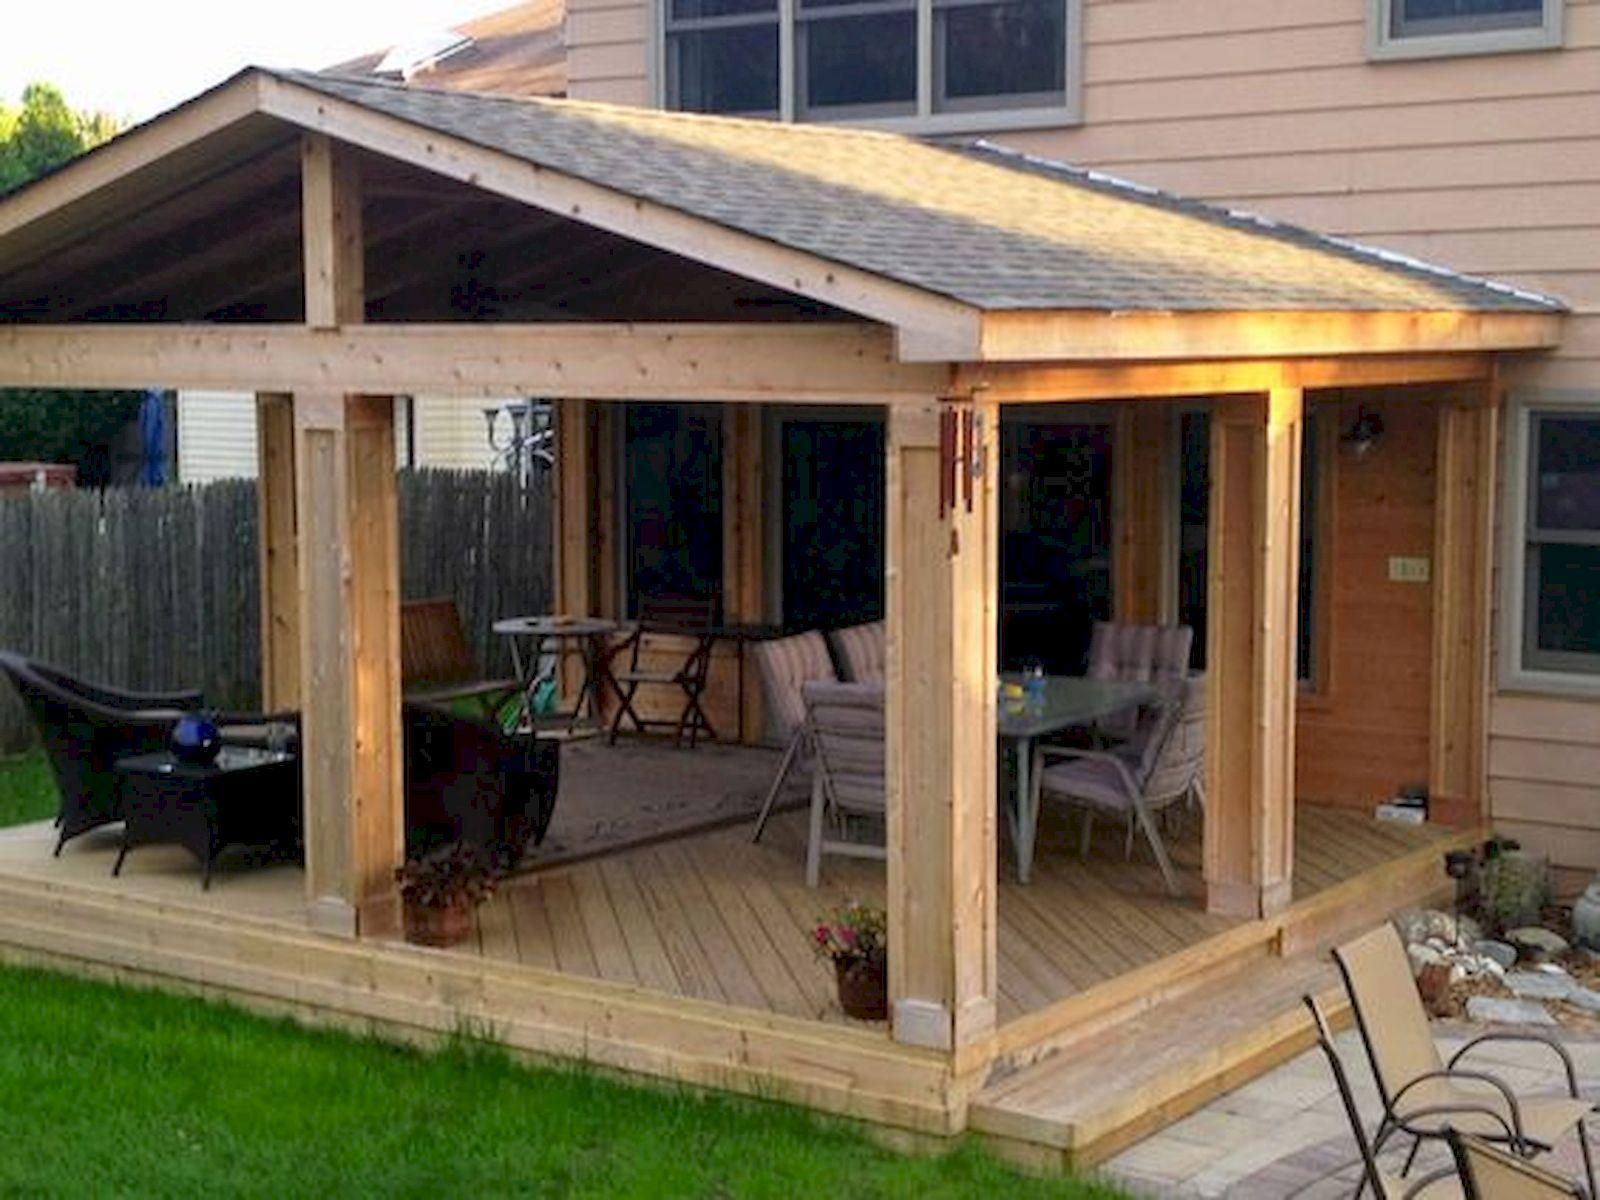 Covered Deck And Pergola Roof Design Ideas 4 Porch Design Roof Design Pergola With Roof